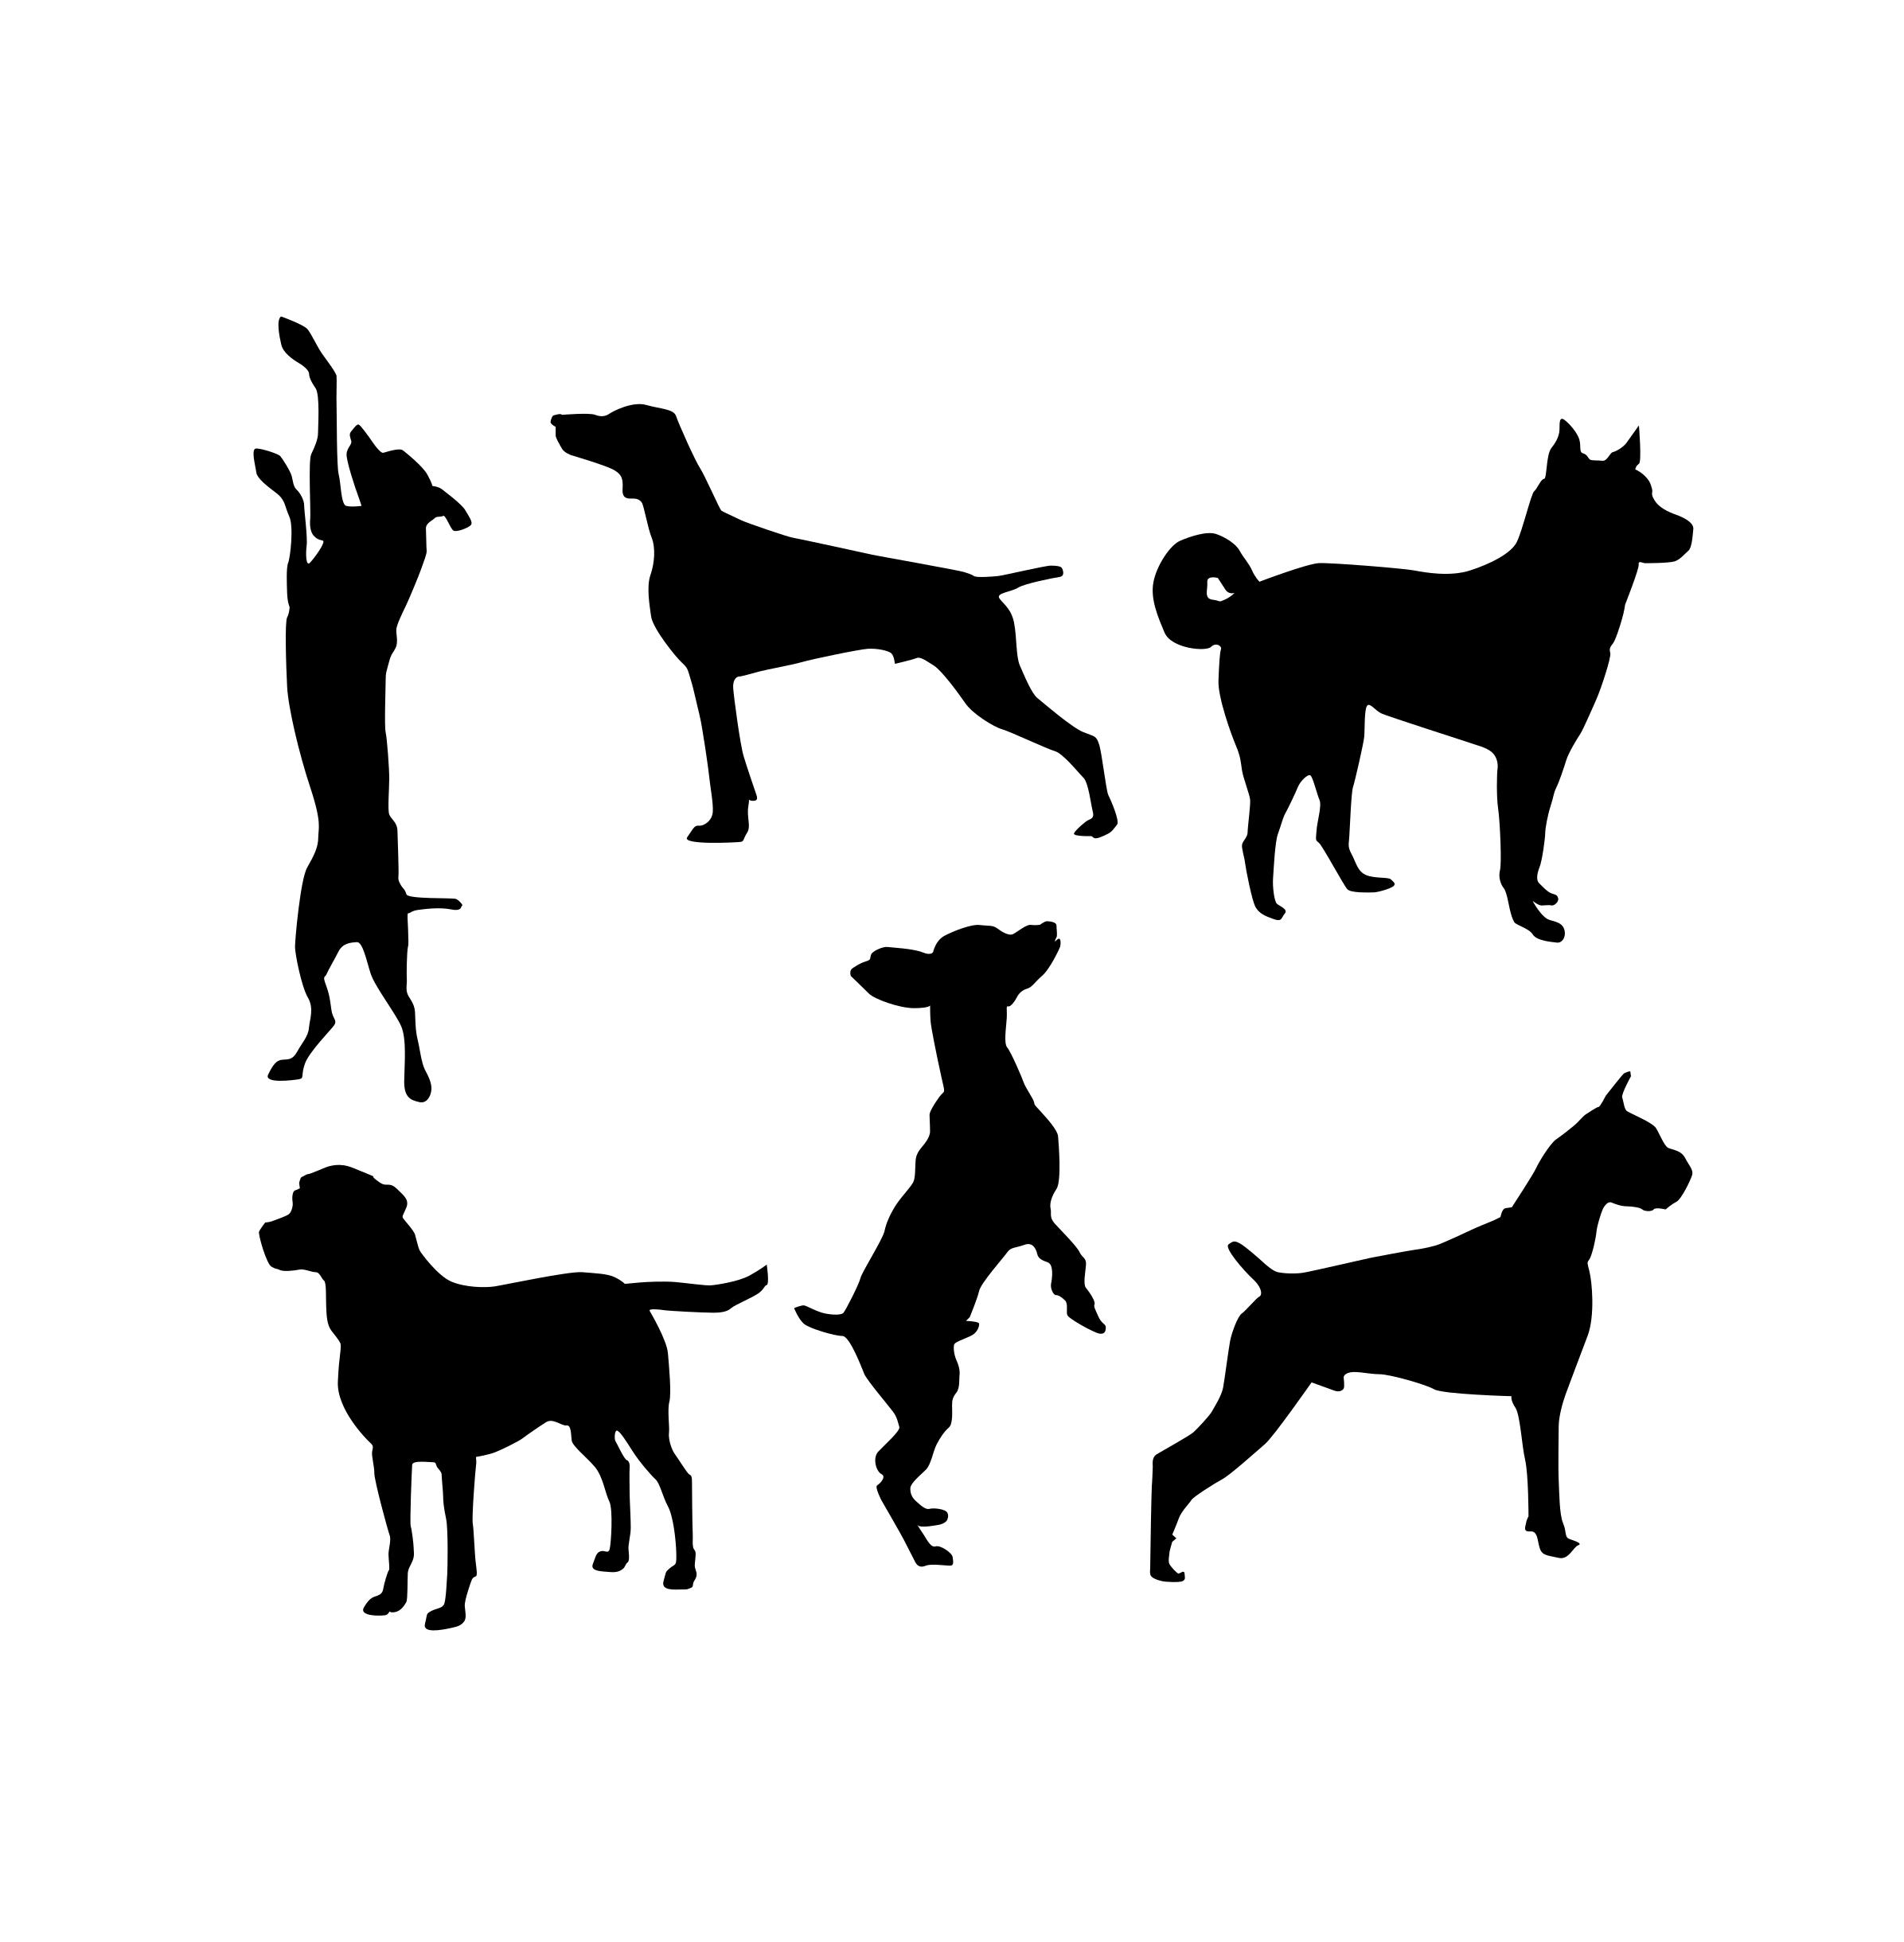 Komplet naklejek psy skok 6szt 45cm  x 40cm